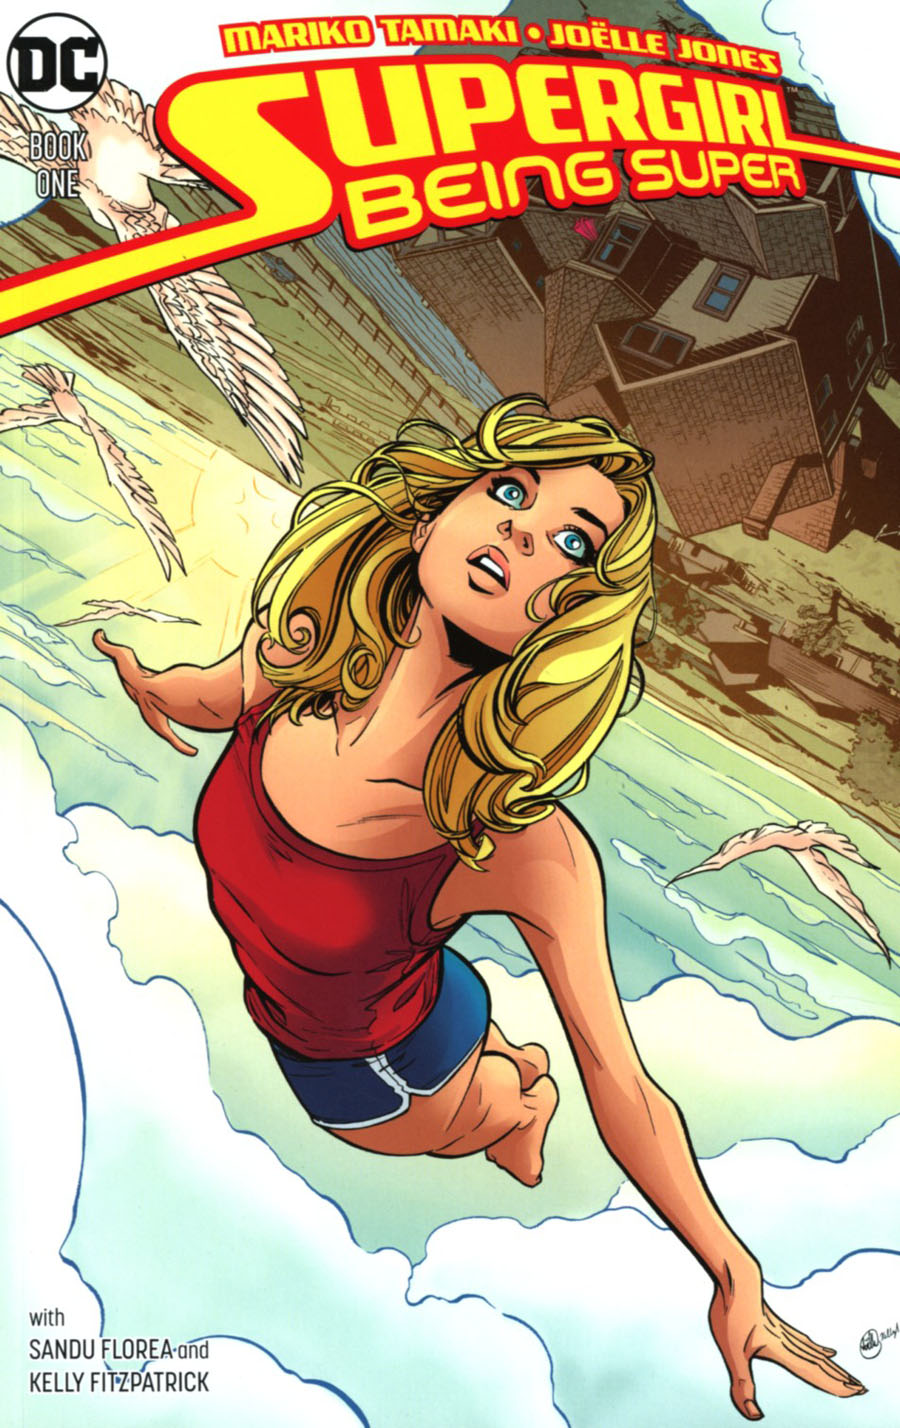 Supergirl Being Super #1